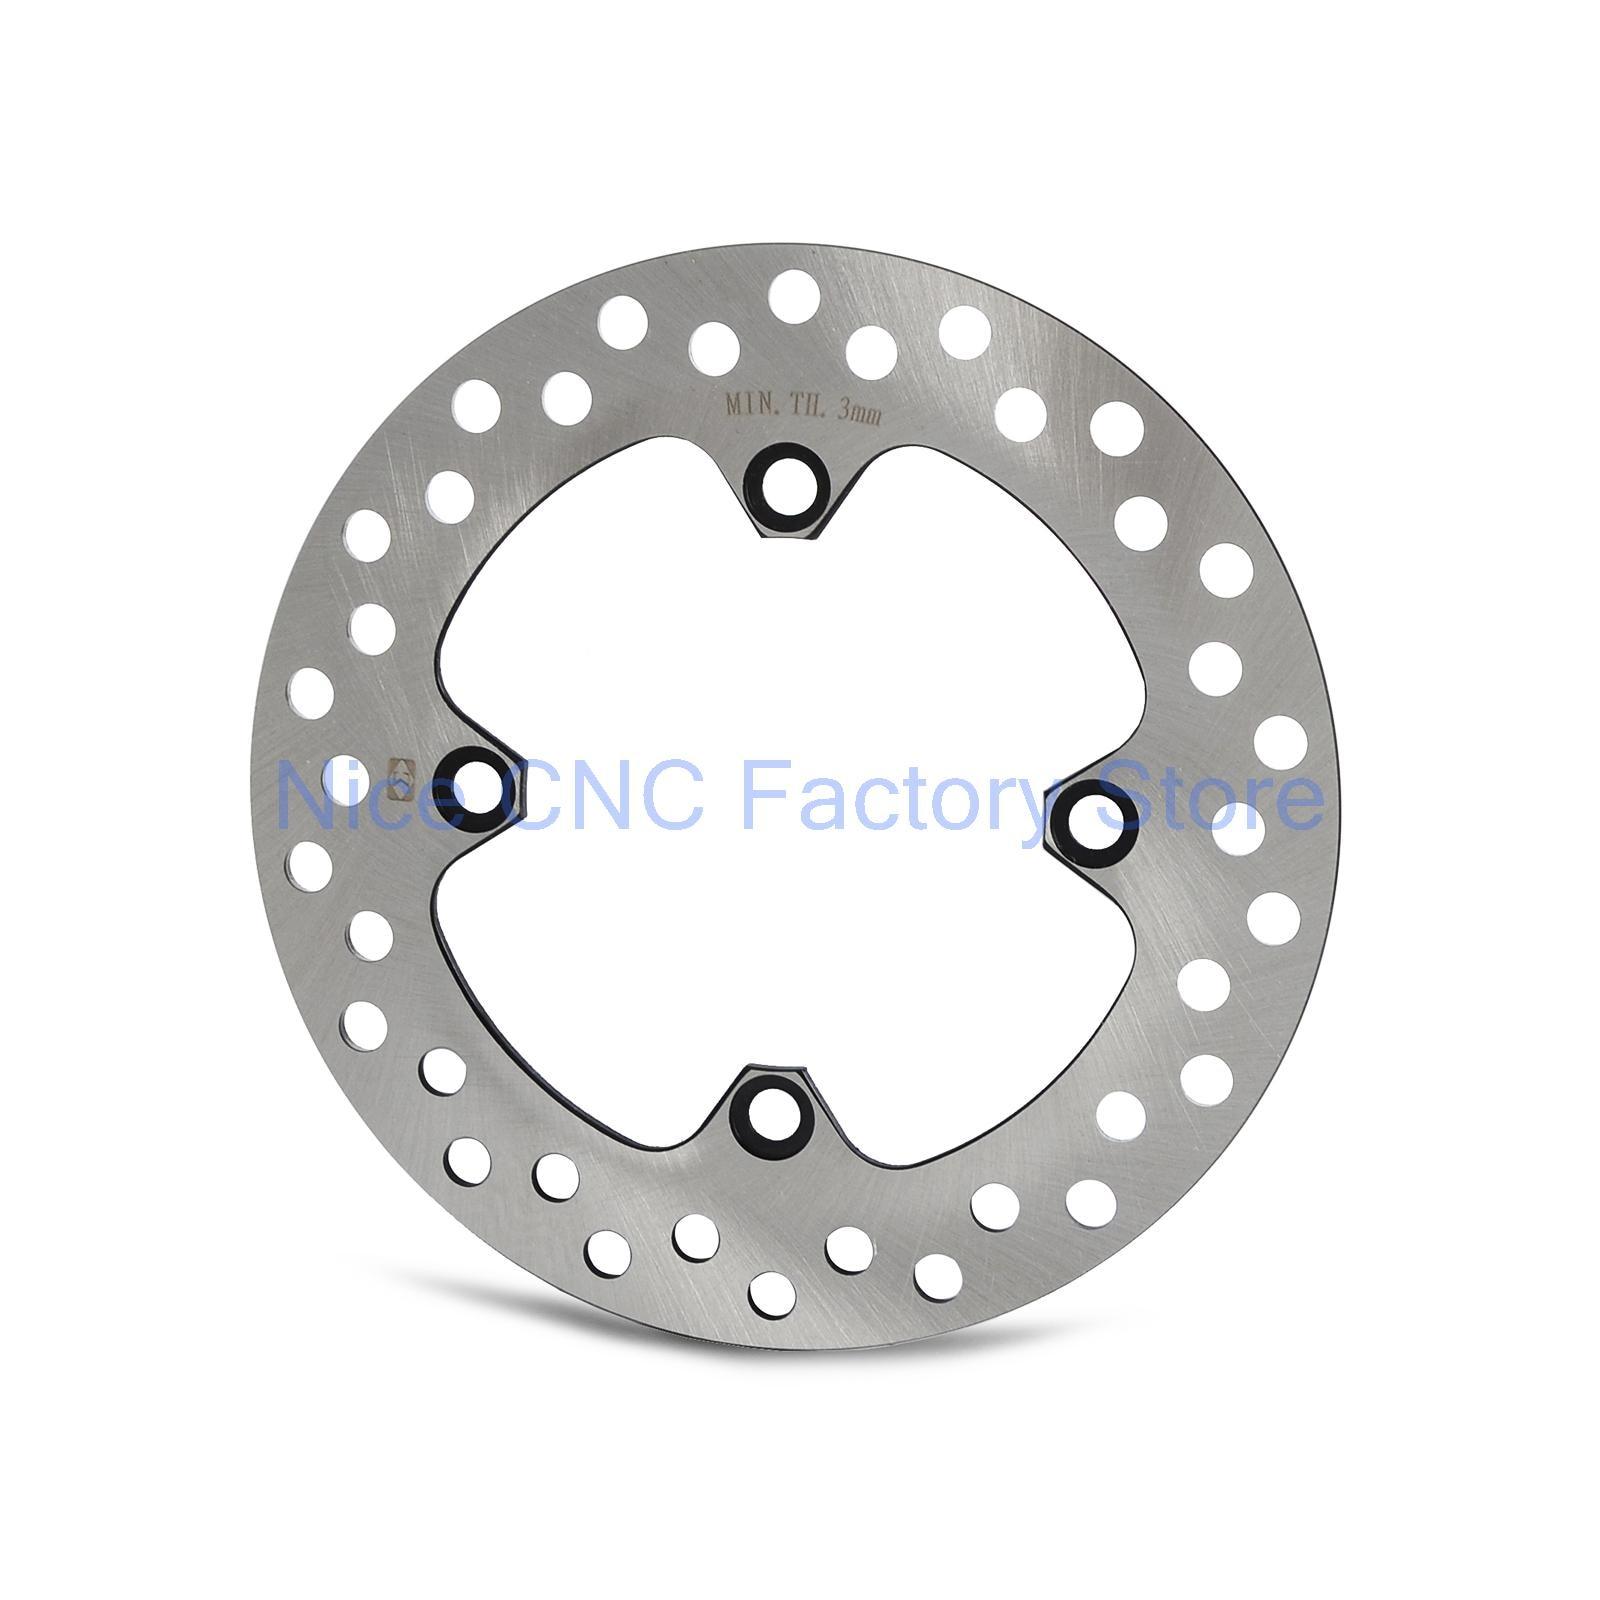 Motorcycle Rear Rotor Brake Disc For Honda CBR125R XR250 XR400 XR600 TRX400 E/EX Kawasaki KFX400 Suzuki LT-Z 400 NEW<br>